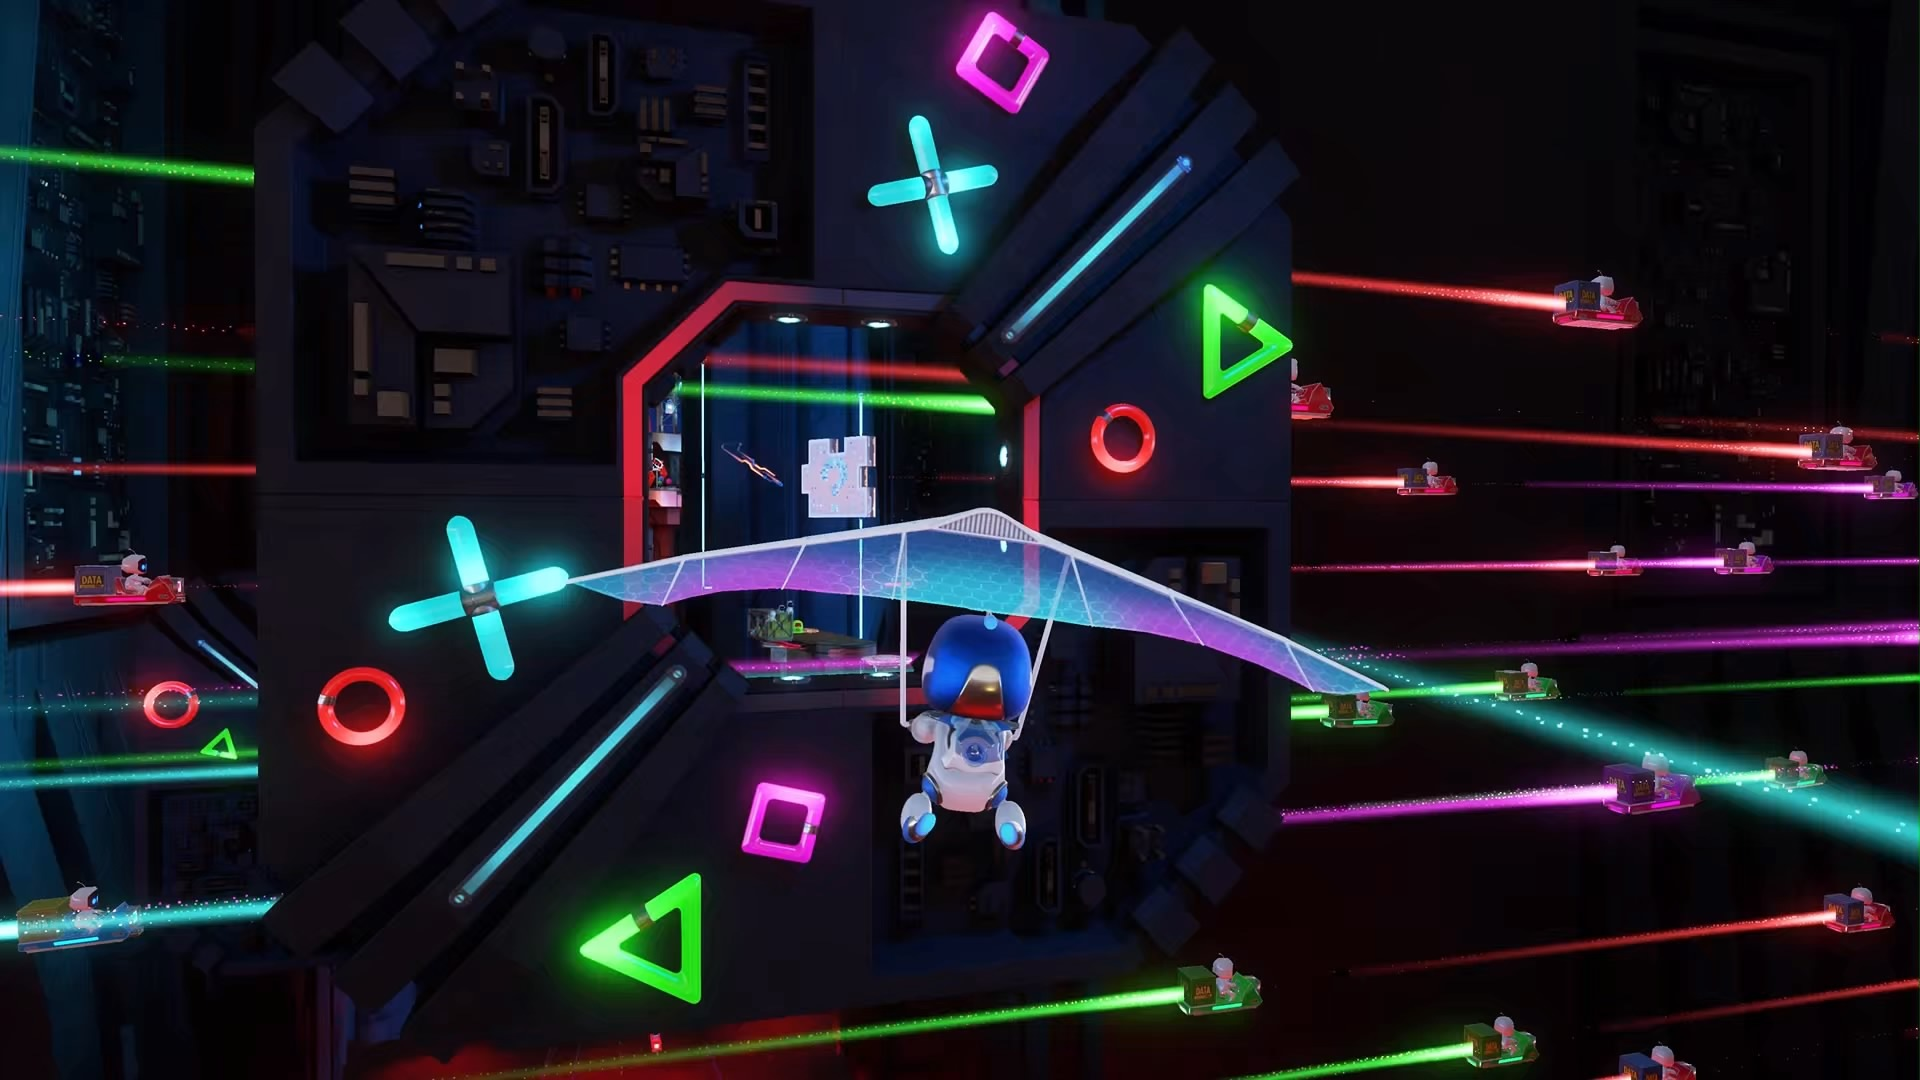 Astros Playroom® データビット発射場-6